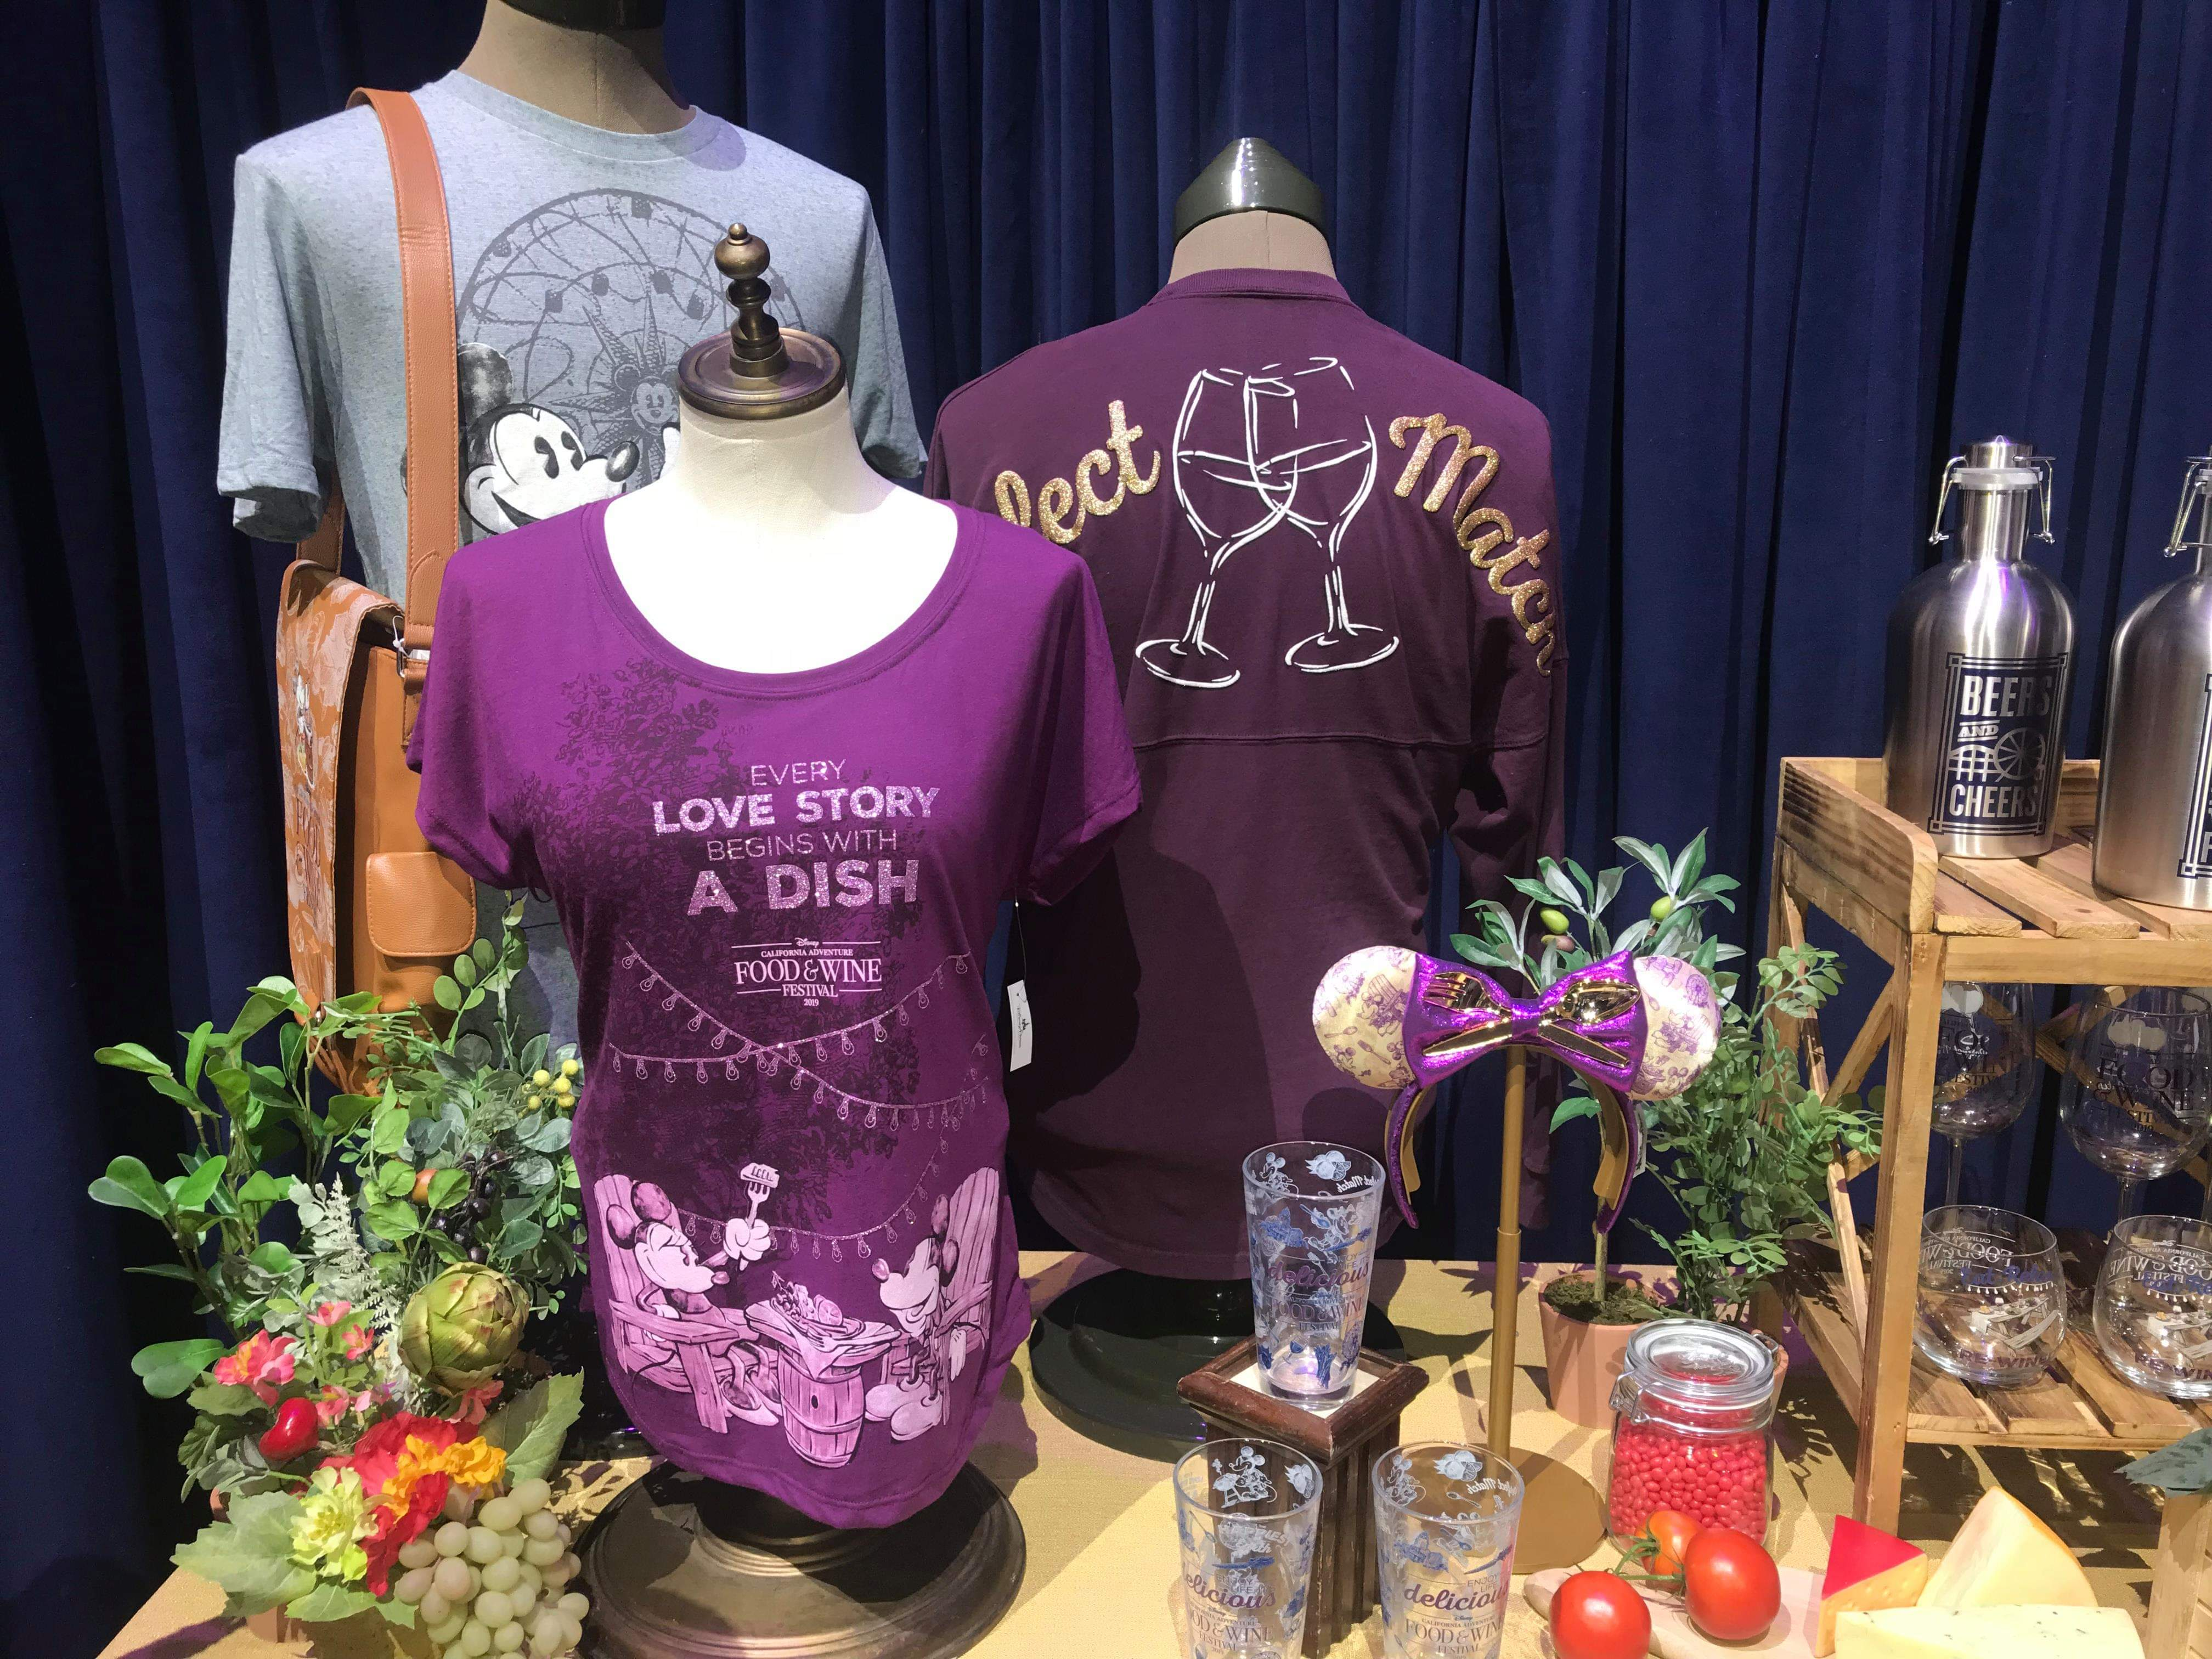 DCA Food & Wine Festival Merchandise